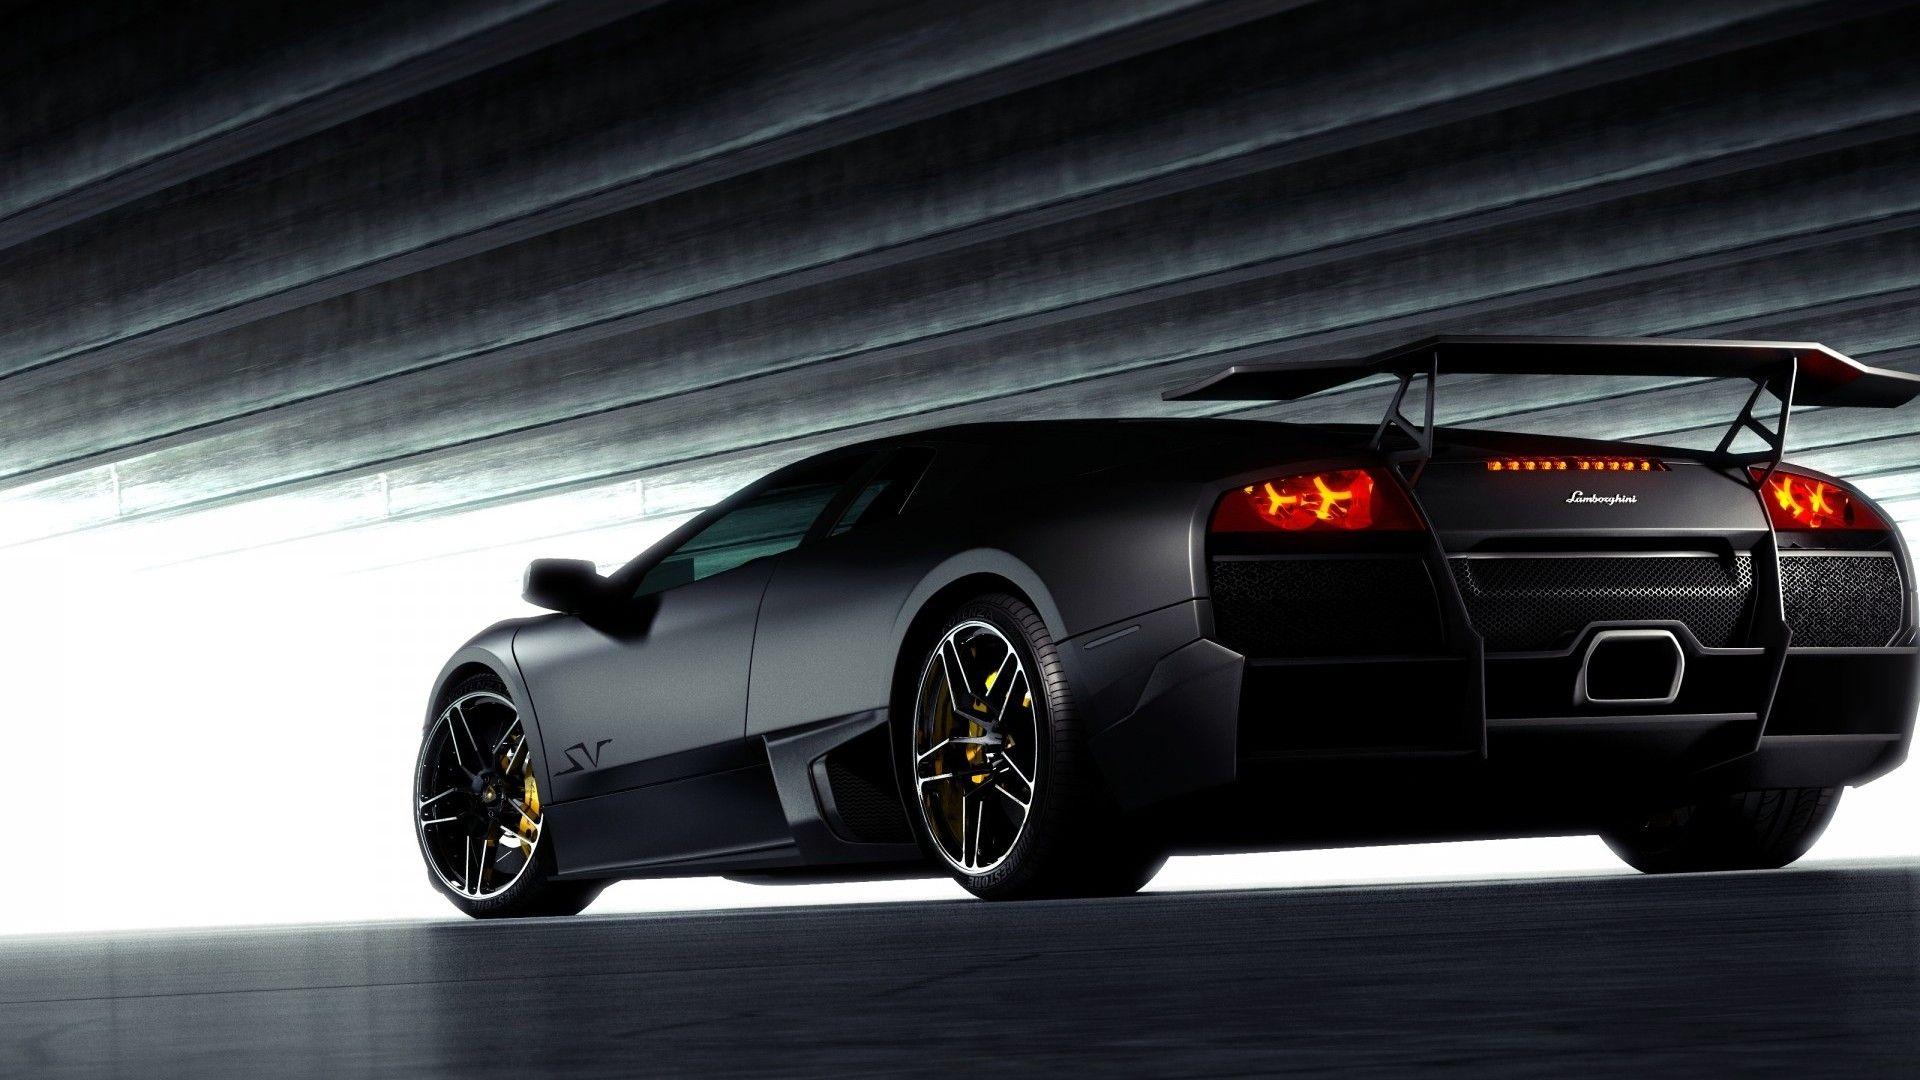 Black Lamborghini Back View HD Wallpapers 1080p Cars